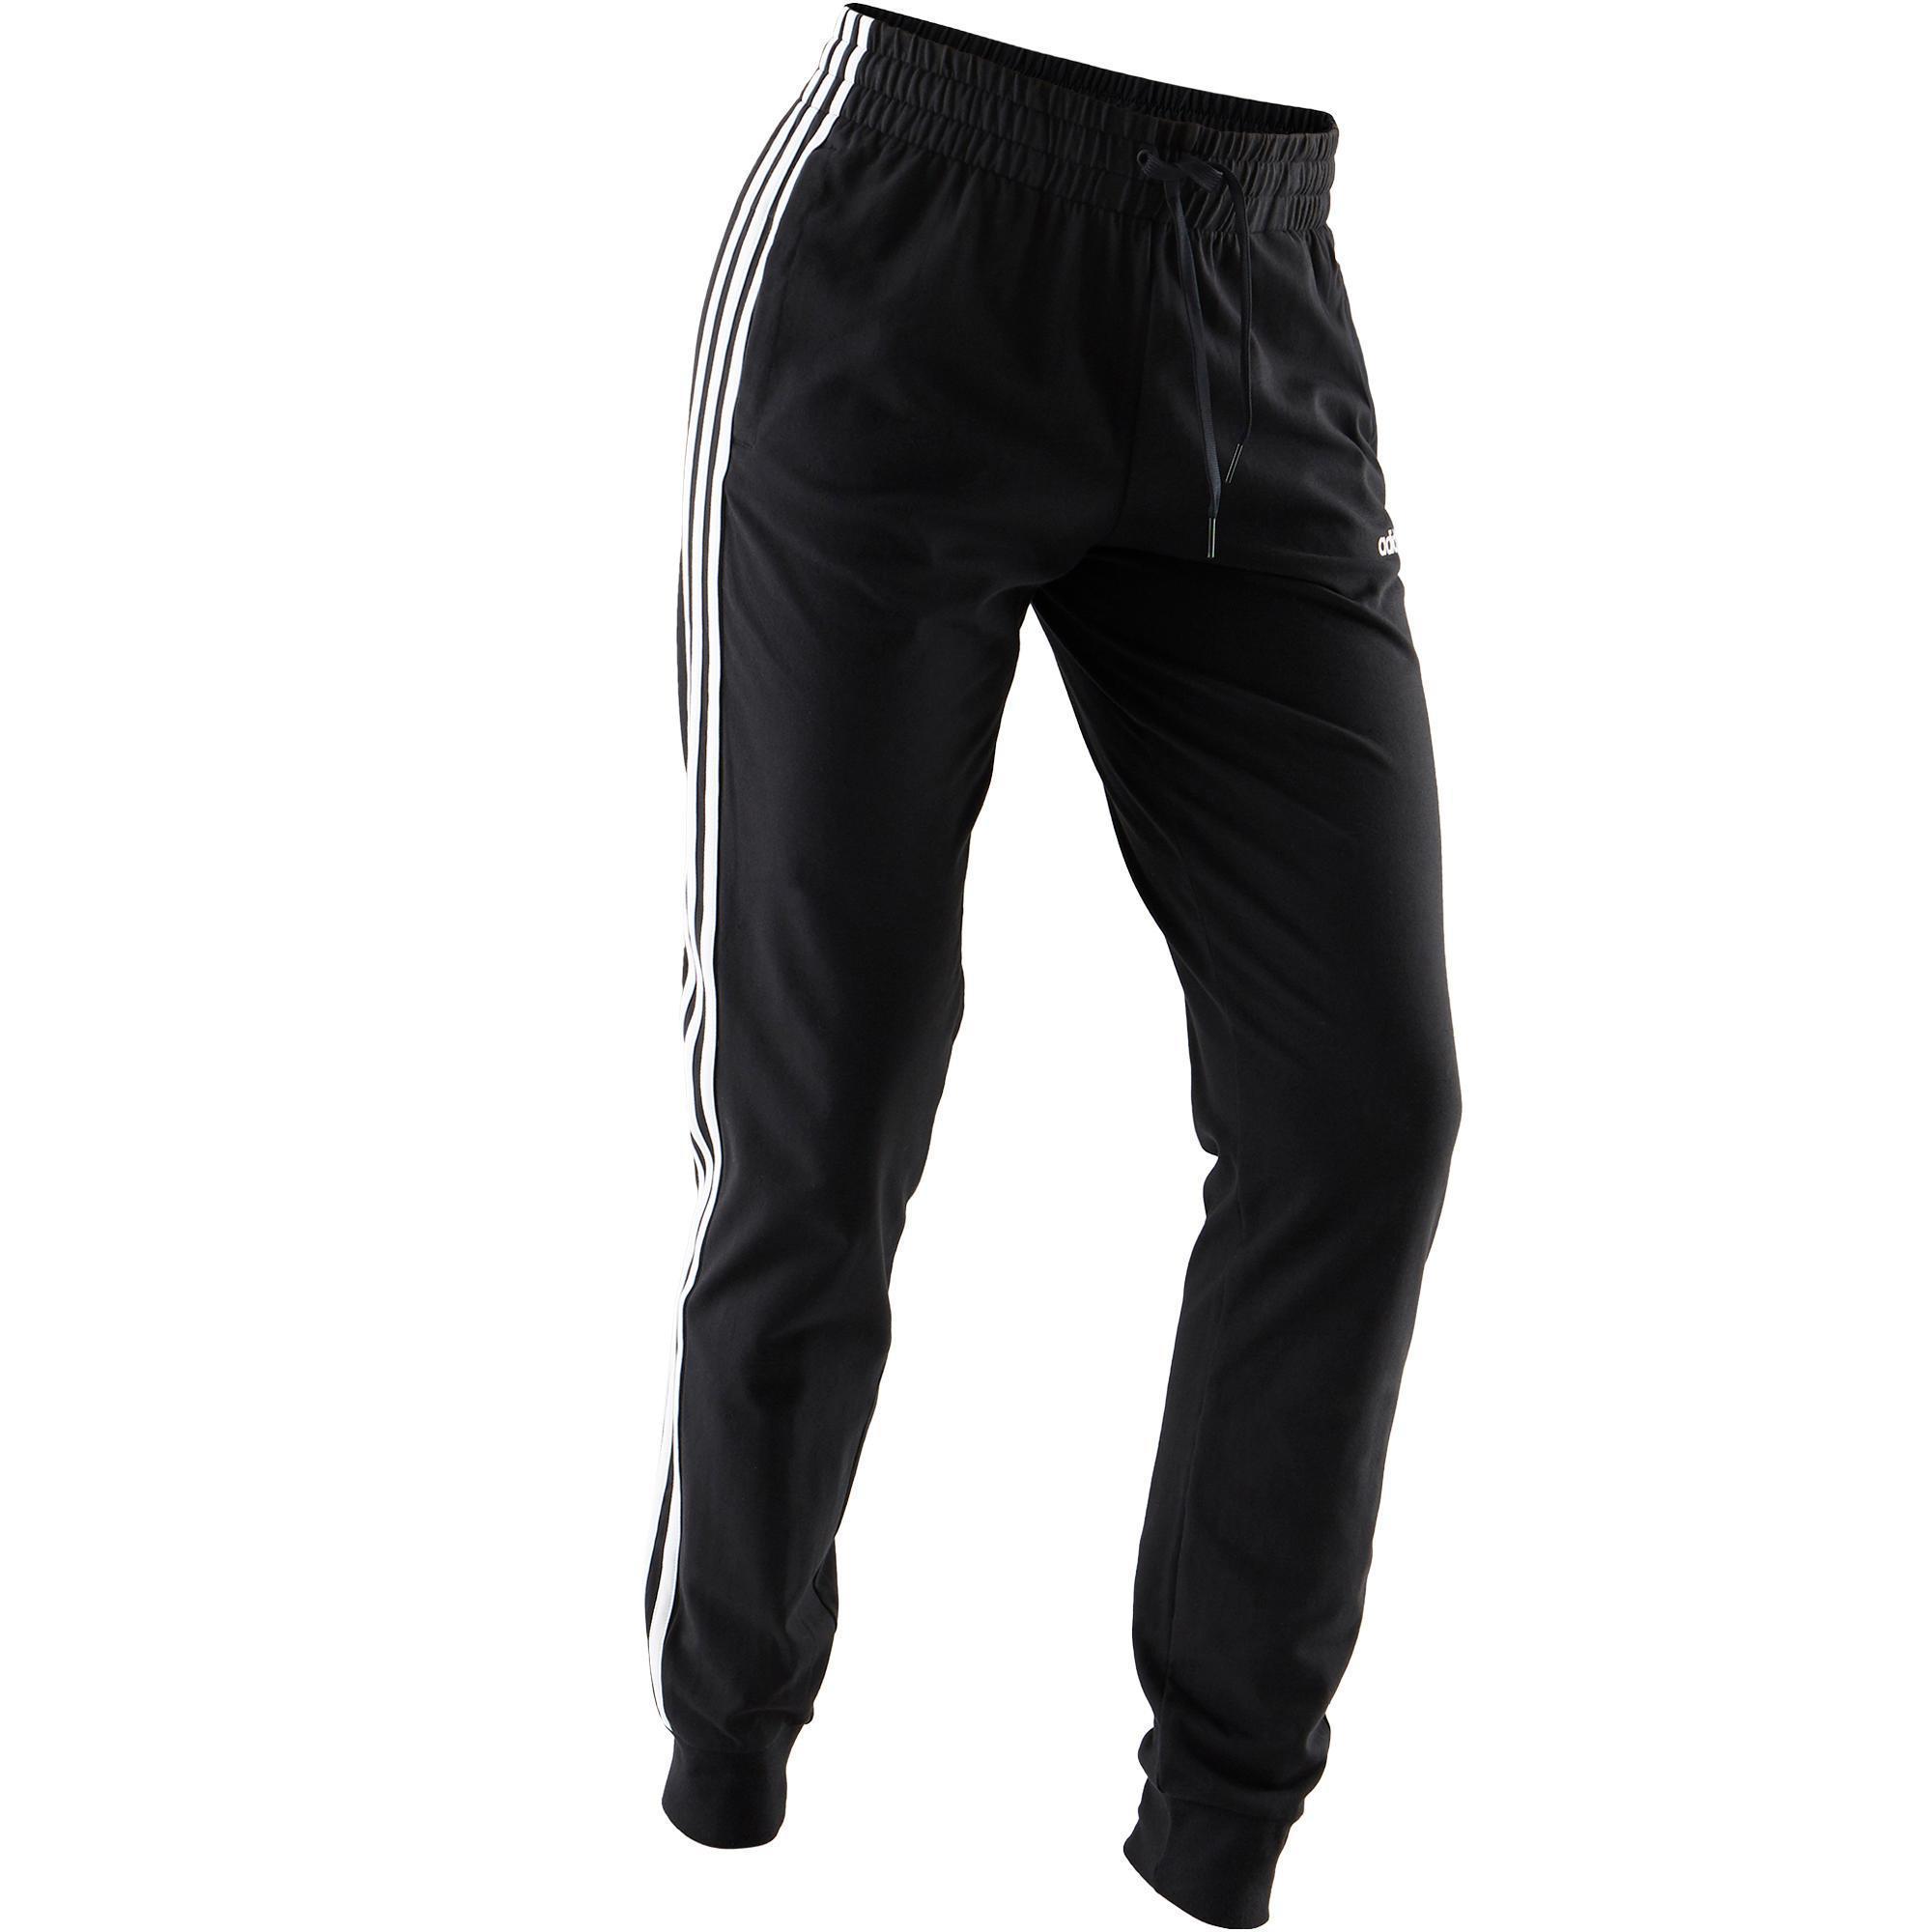 Pantalones Adidas - Decathlon 0c10fbe2dd2c